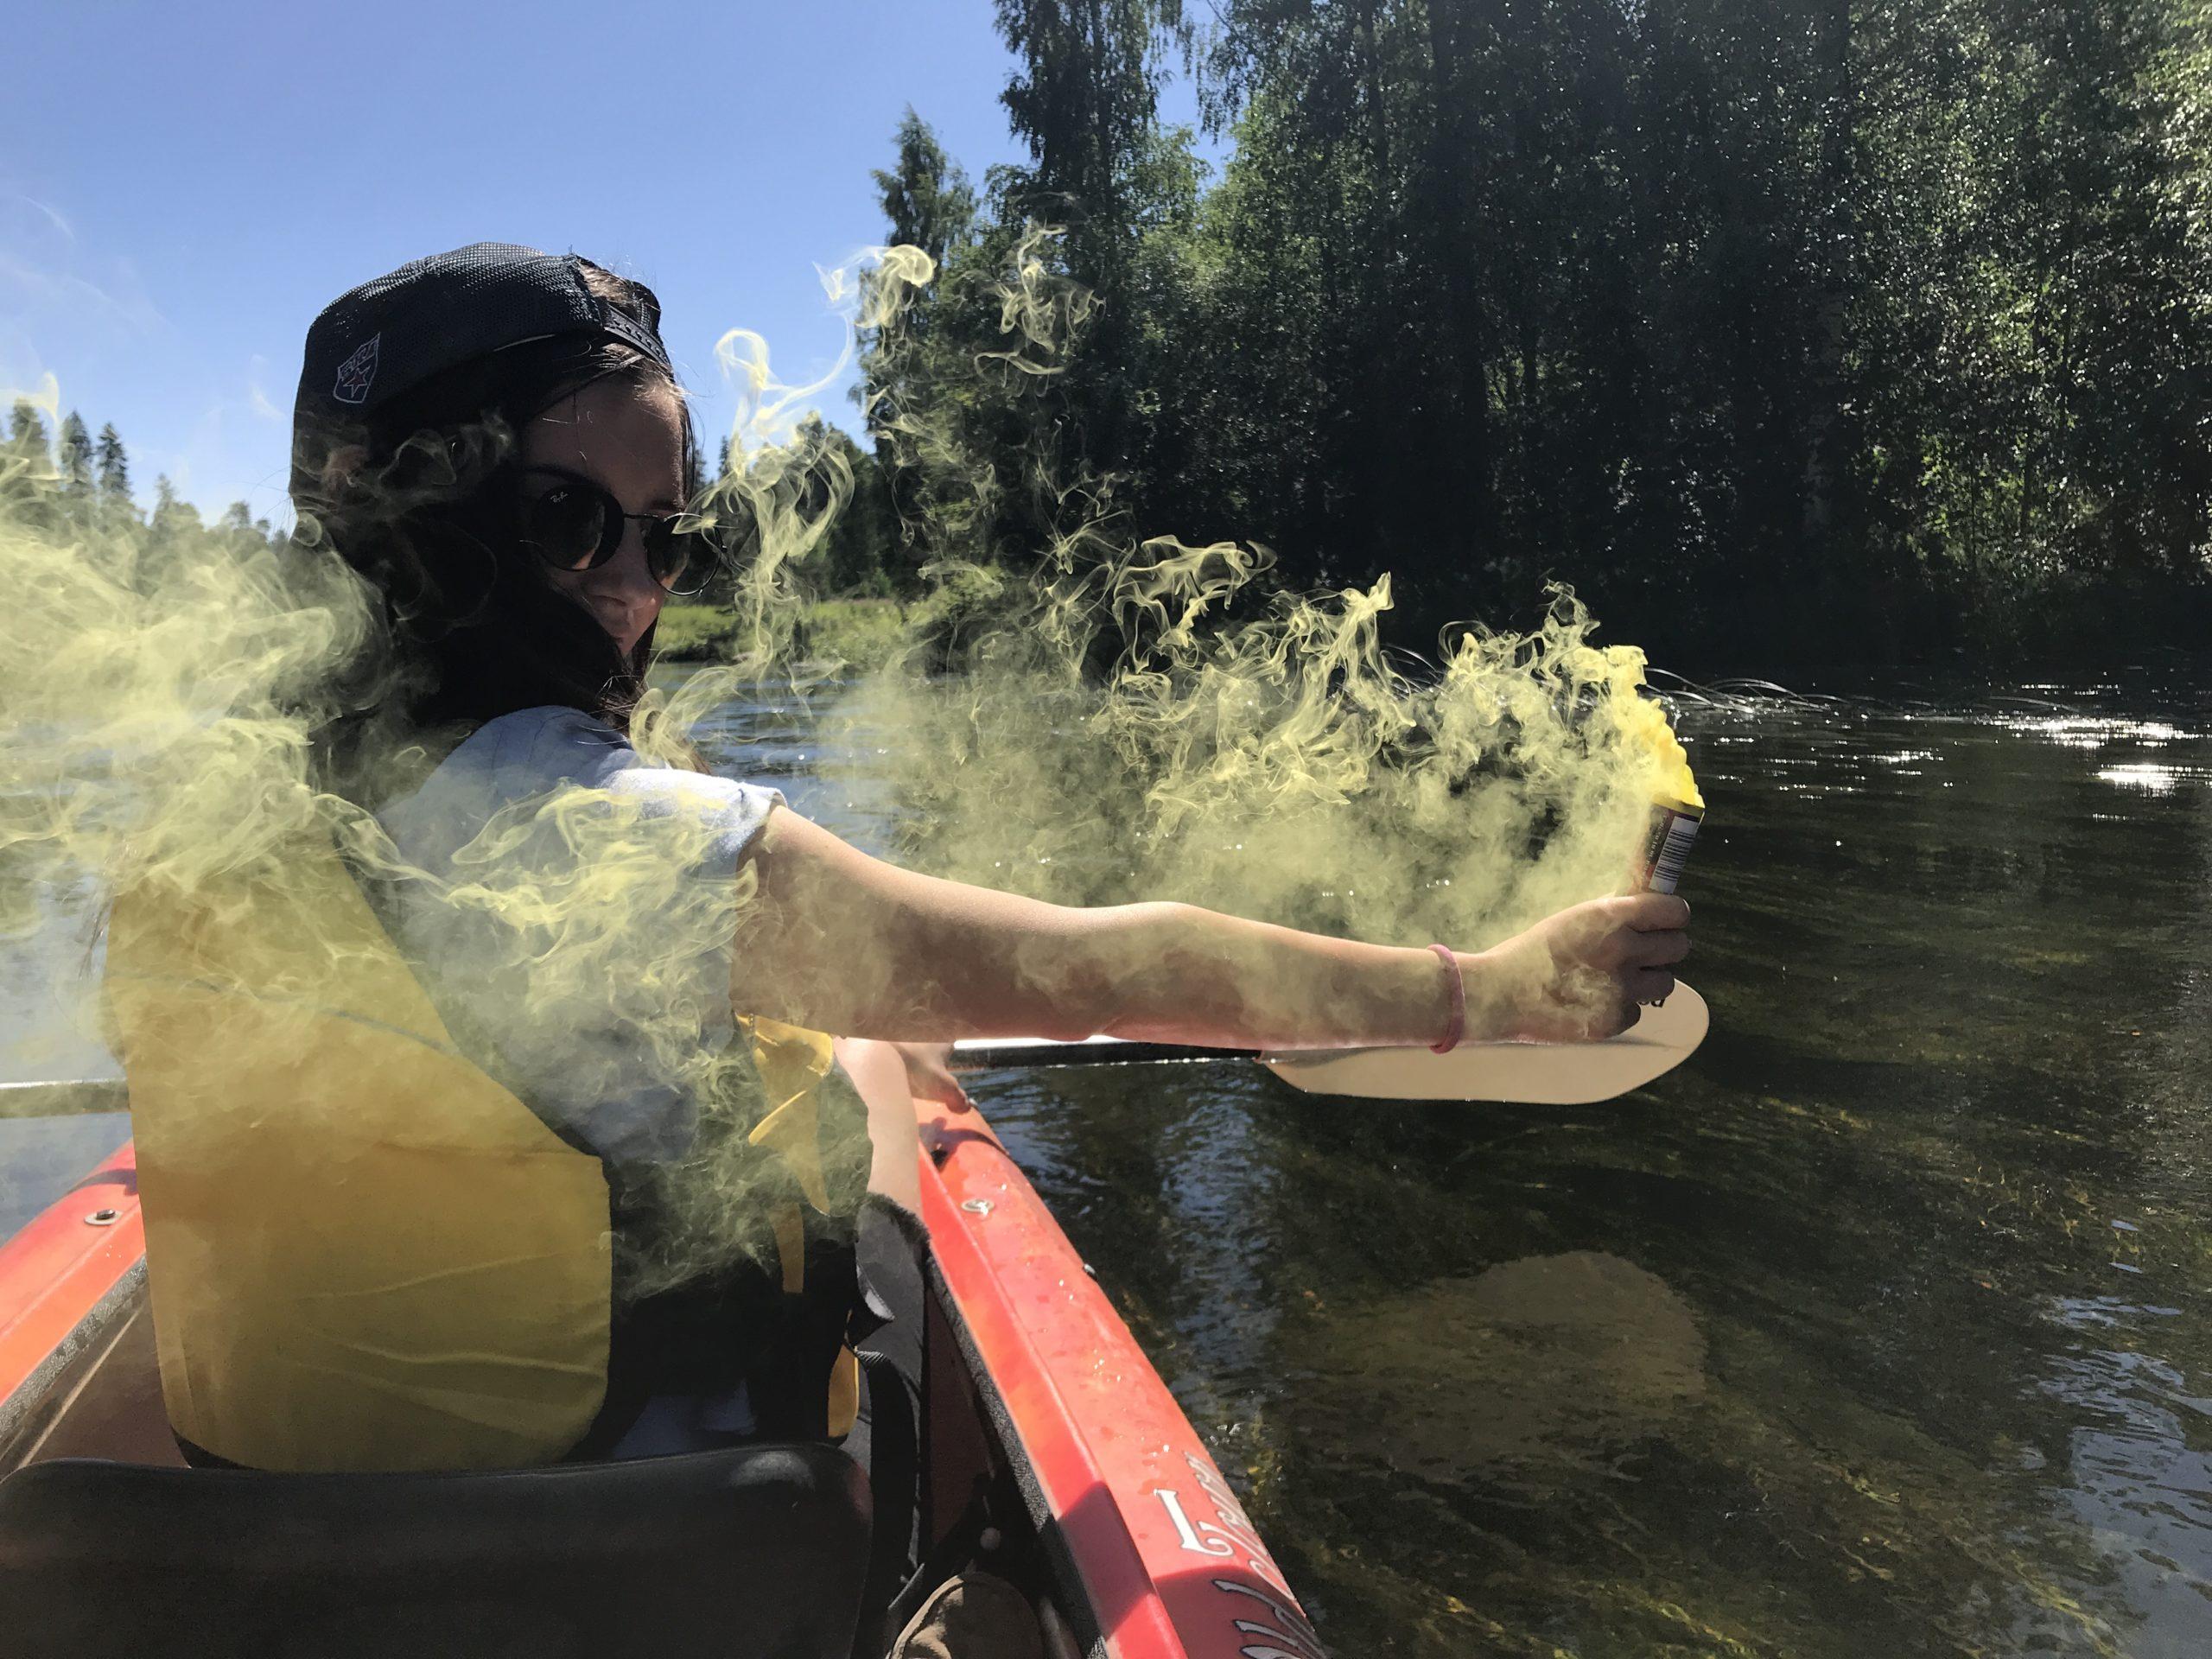 Дымовые шашки желтые